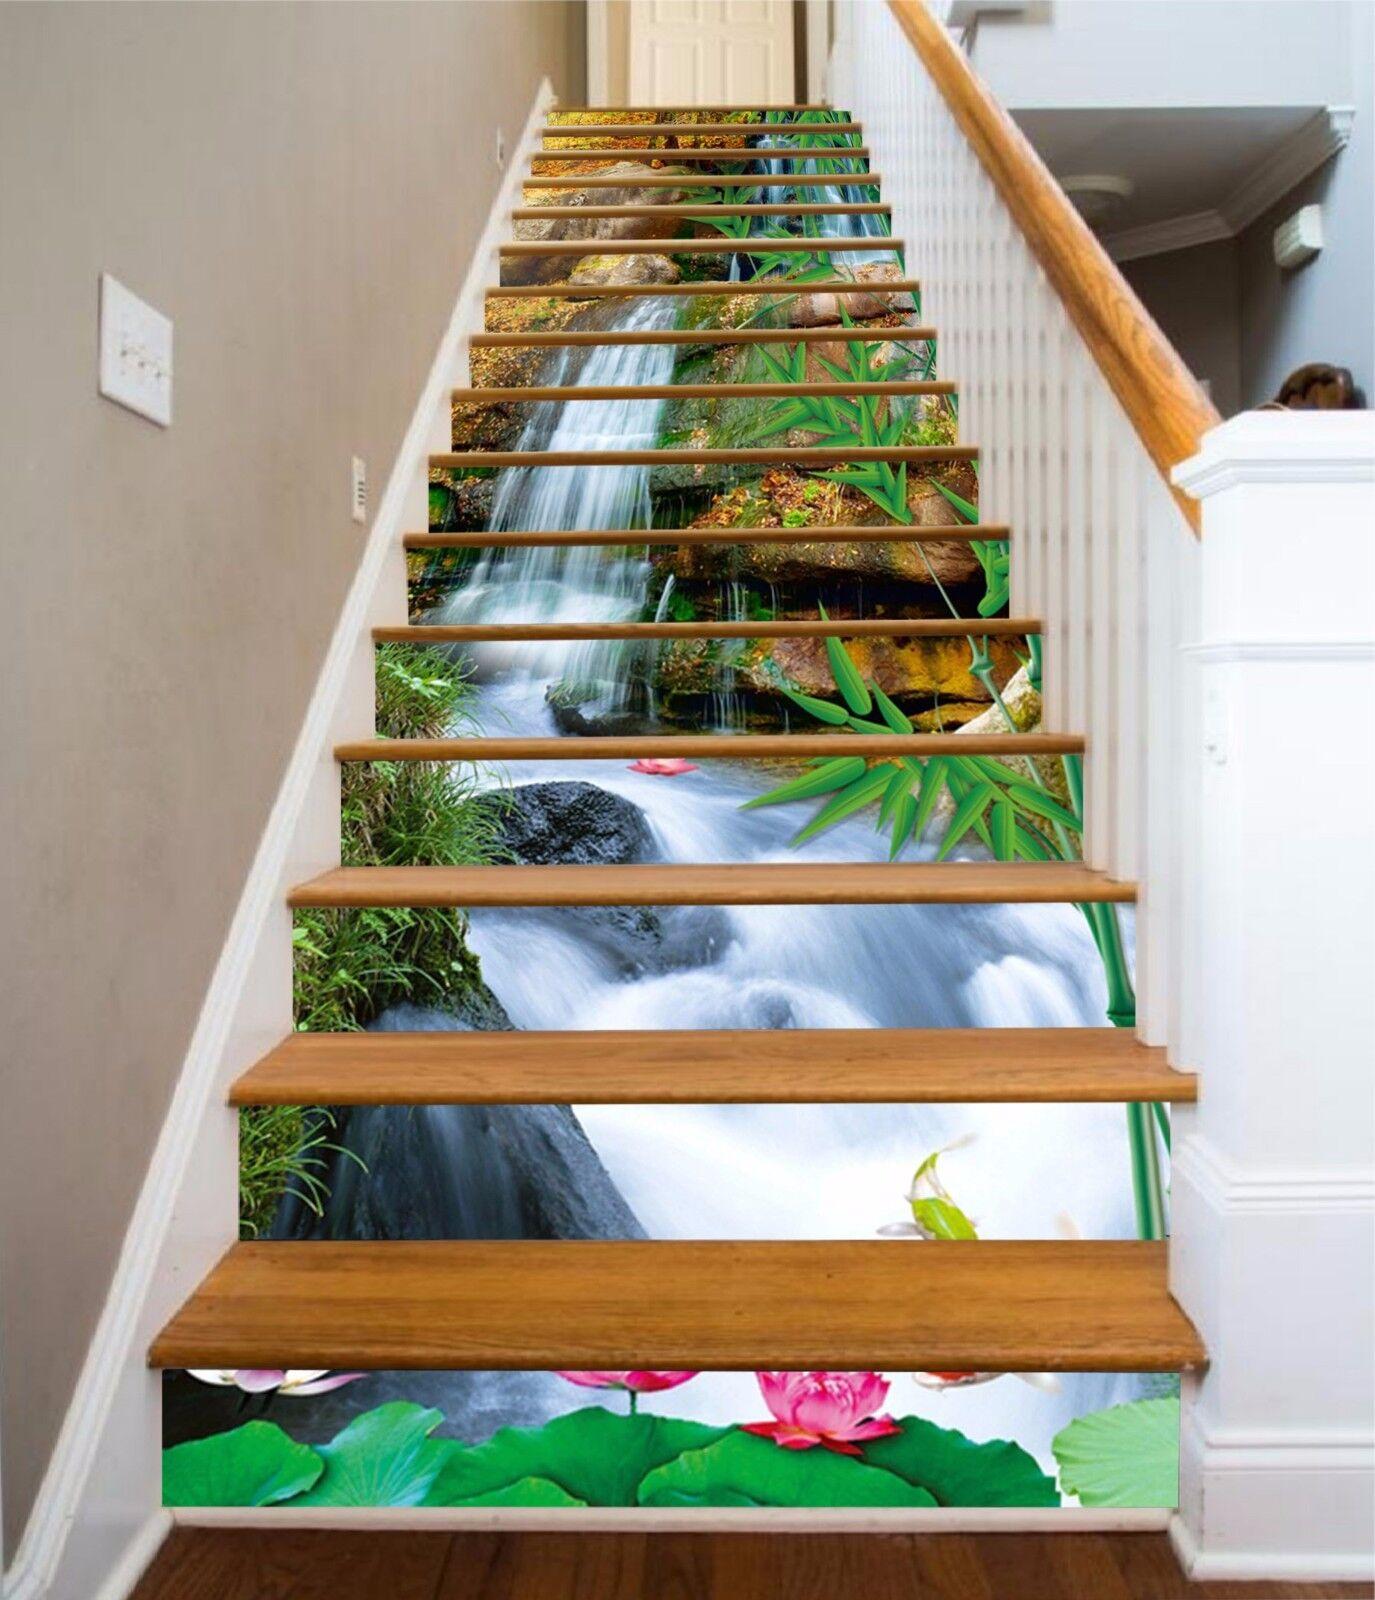 3D Bamboo Lotus 783 Stair Risers Decoration Photo Mural Vinyl Decal Wallpaper AU